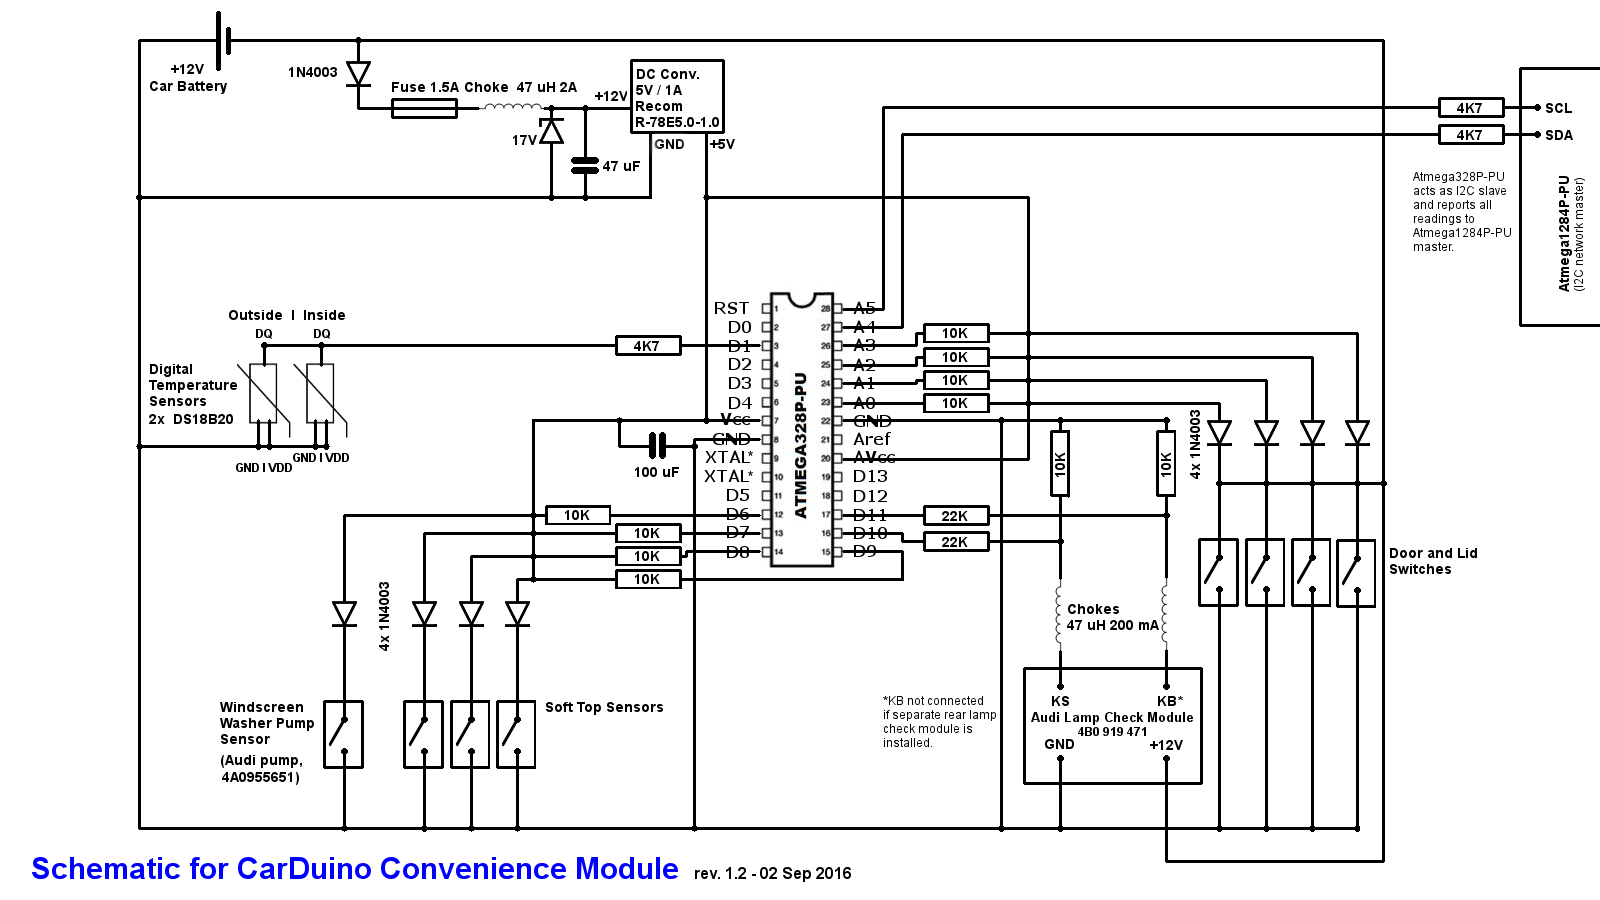 np242 wiring diagram dash cam for fuse box skytrak wiring